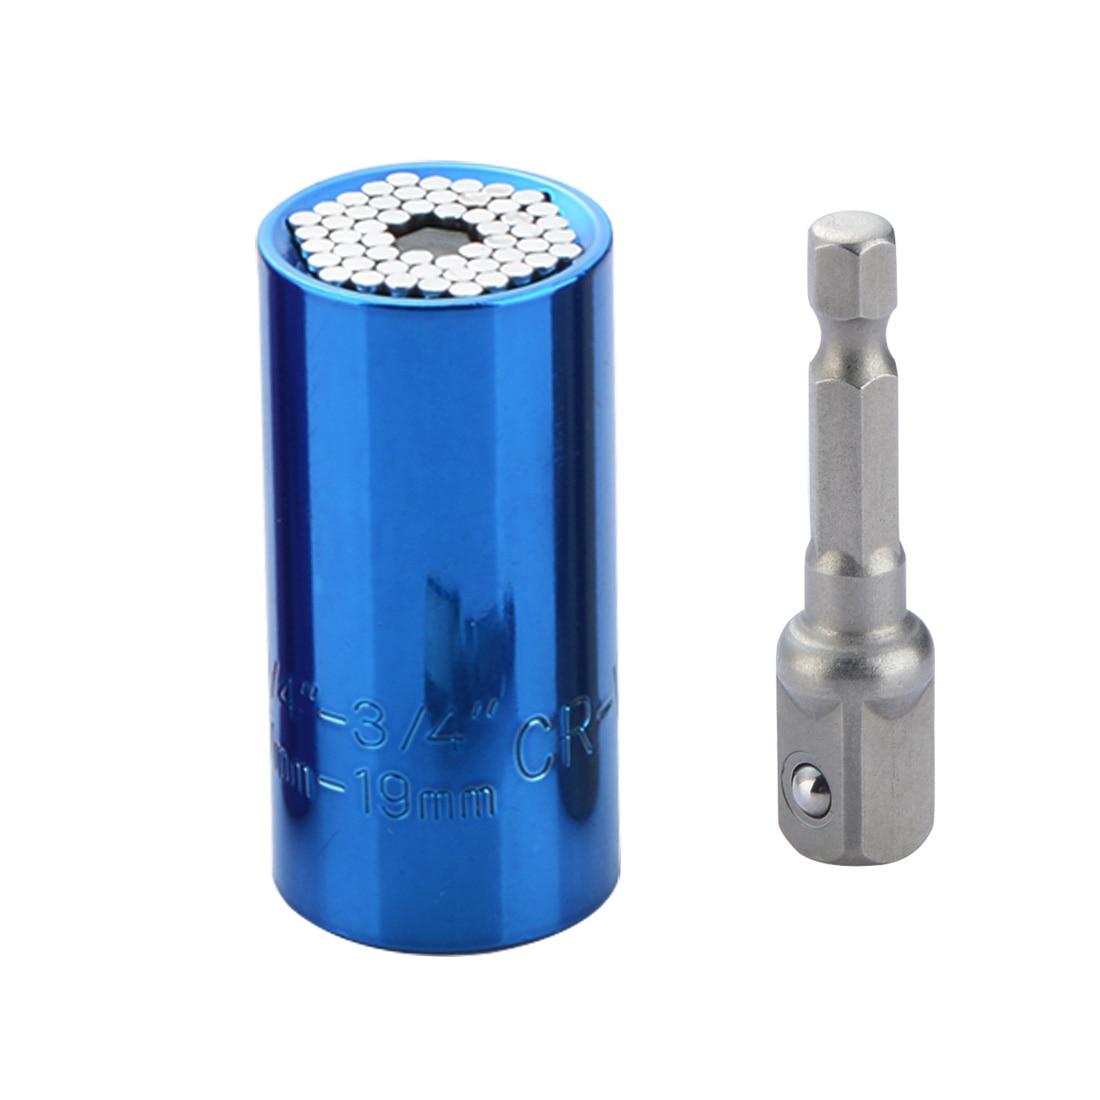 все цены на Universal Multifunctional sleeve Wrench Set Head Key Sleeve Socket 7-19mm connecting rod Ratchet Spanner Power Drill Kits онлайн